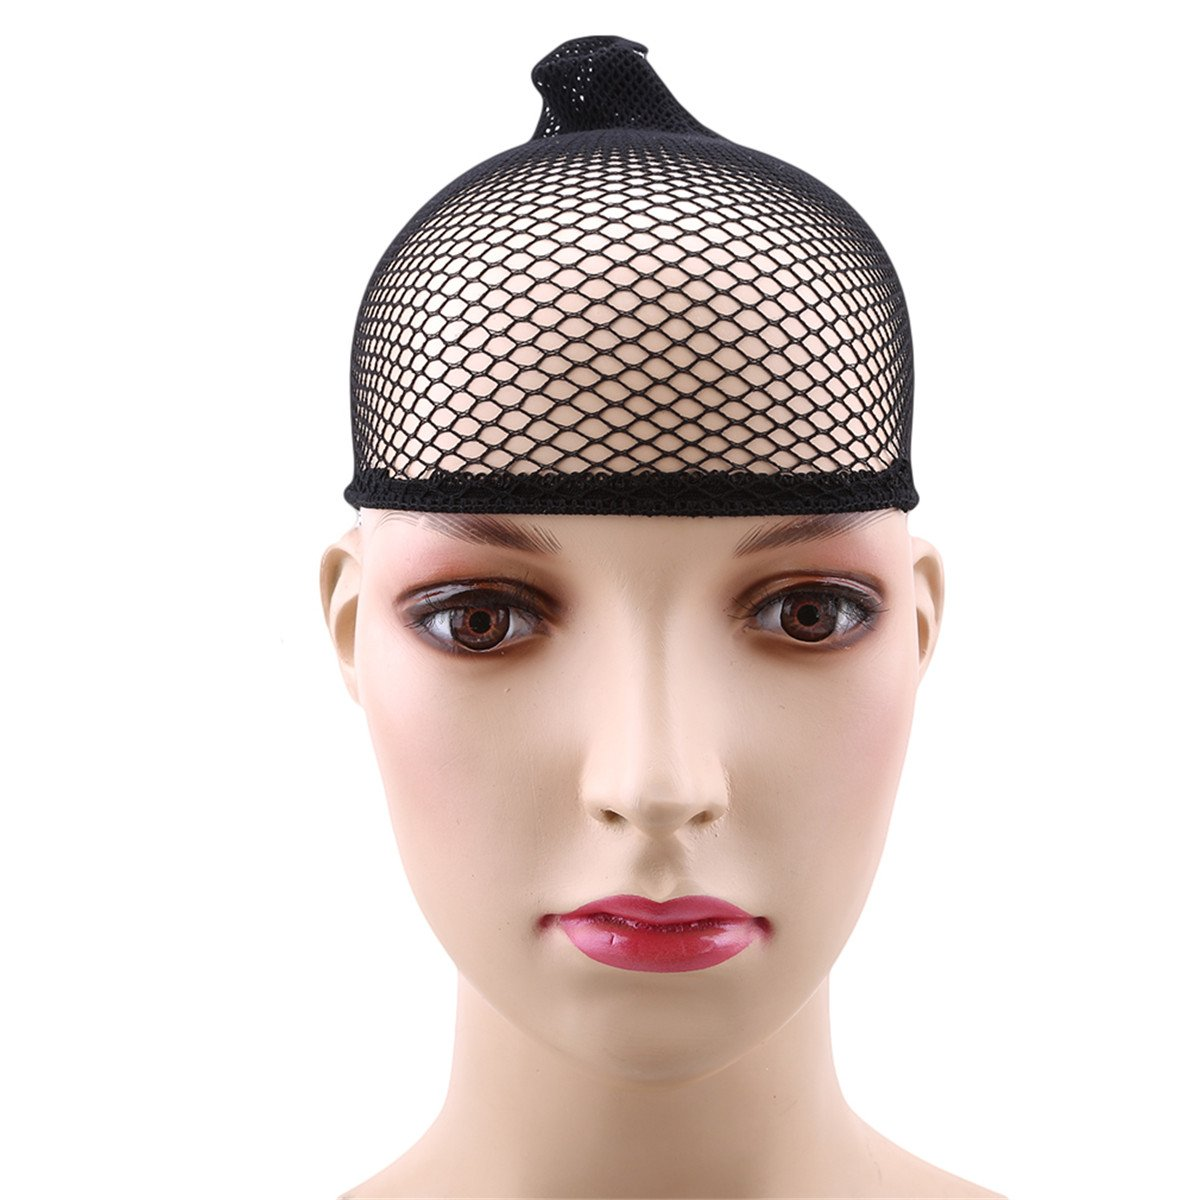 CH Hair Elastic Wig Cap Fishnet Liner Weaving Mesh Stocking Sleep Net Black Hat